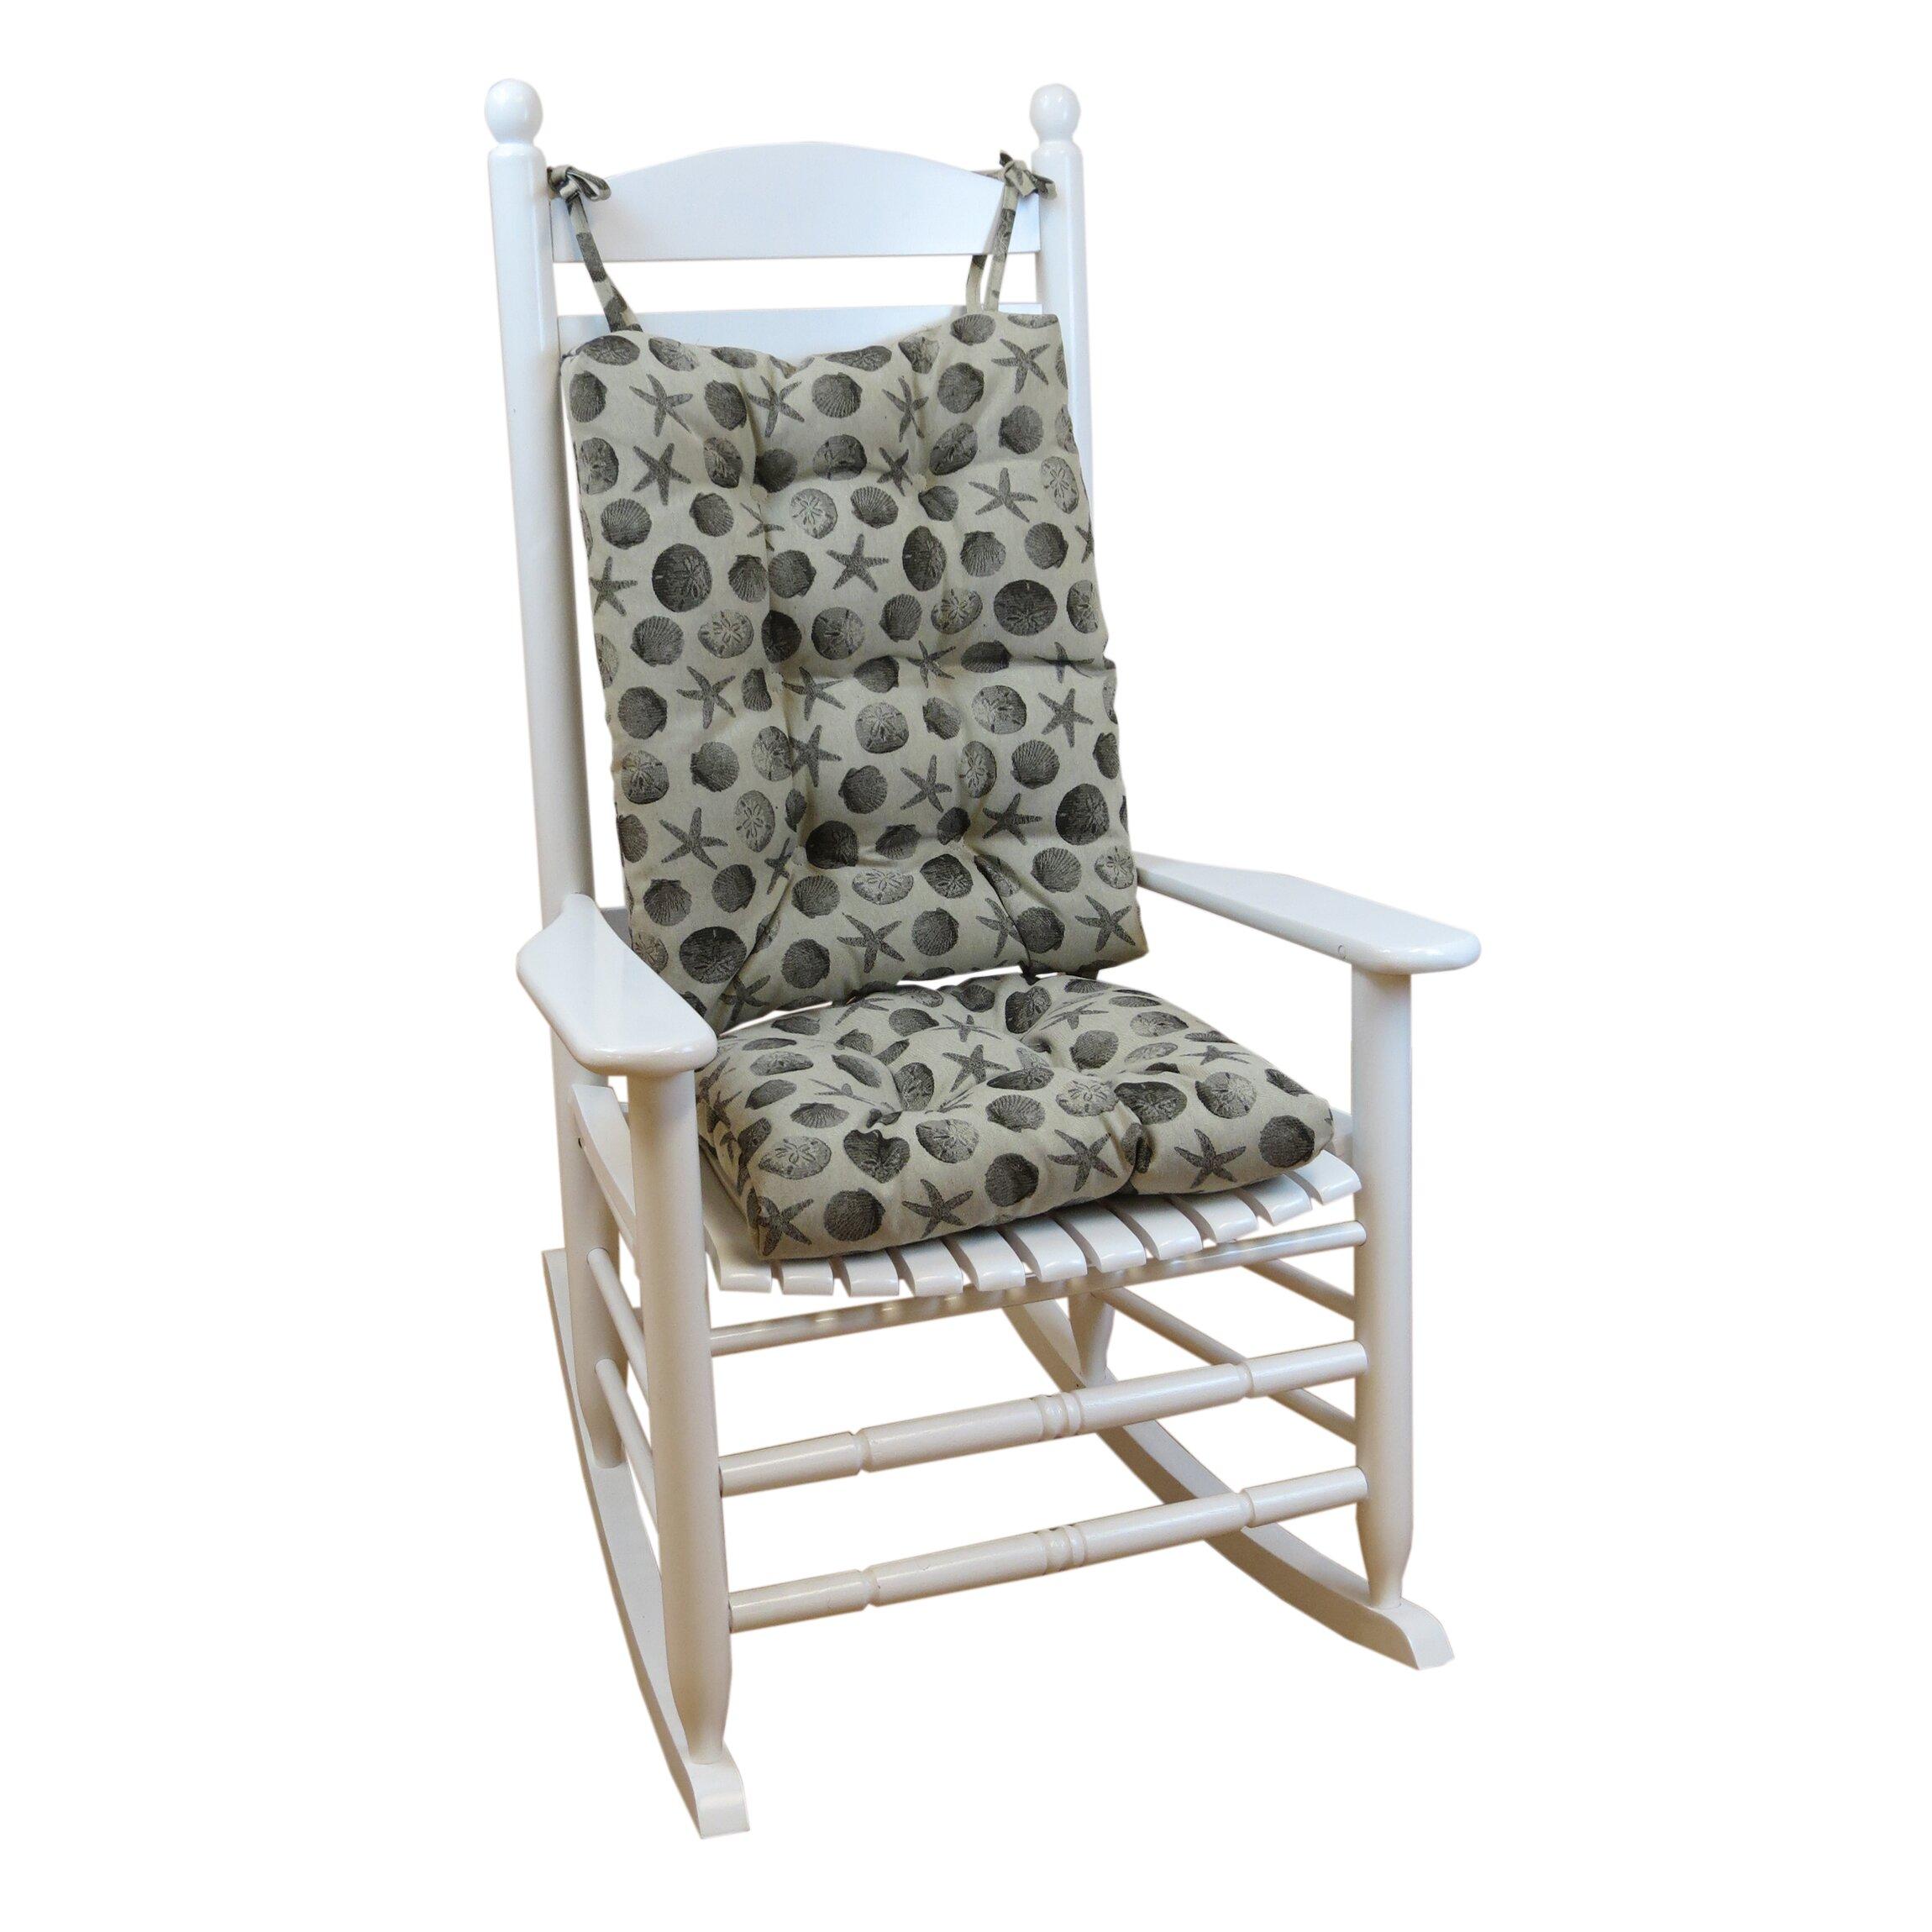 Klear Vu Seashell Rocking Chair Cushion amp Reviews Wayfairca : Klear Vu Seashell Rocking Chair Cushion from www.wayfair.ca size 2300 x 2300 jpeg 447kB